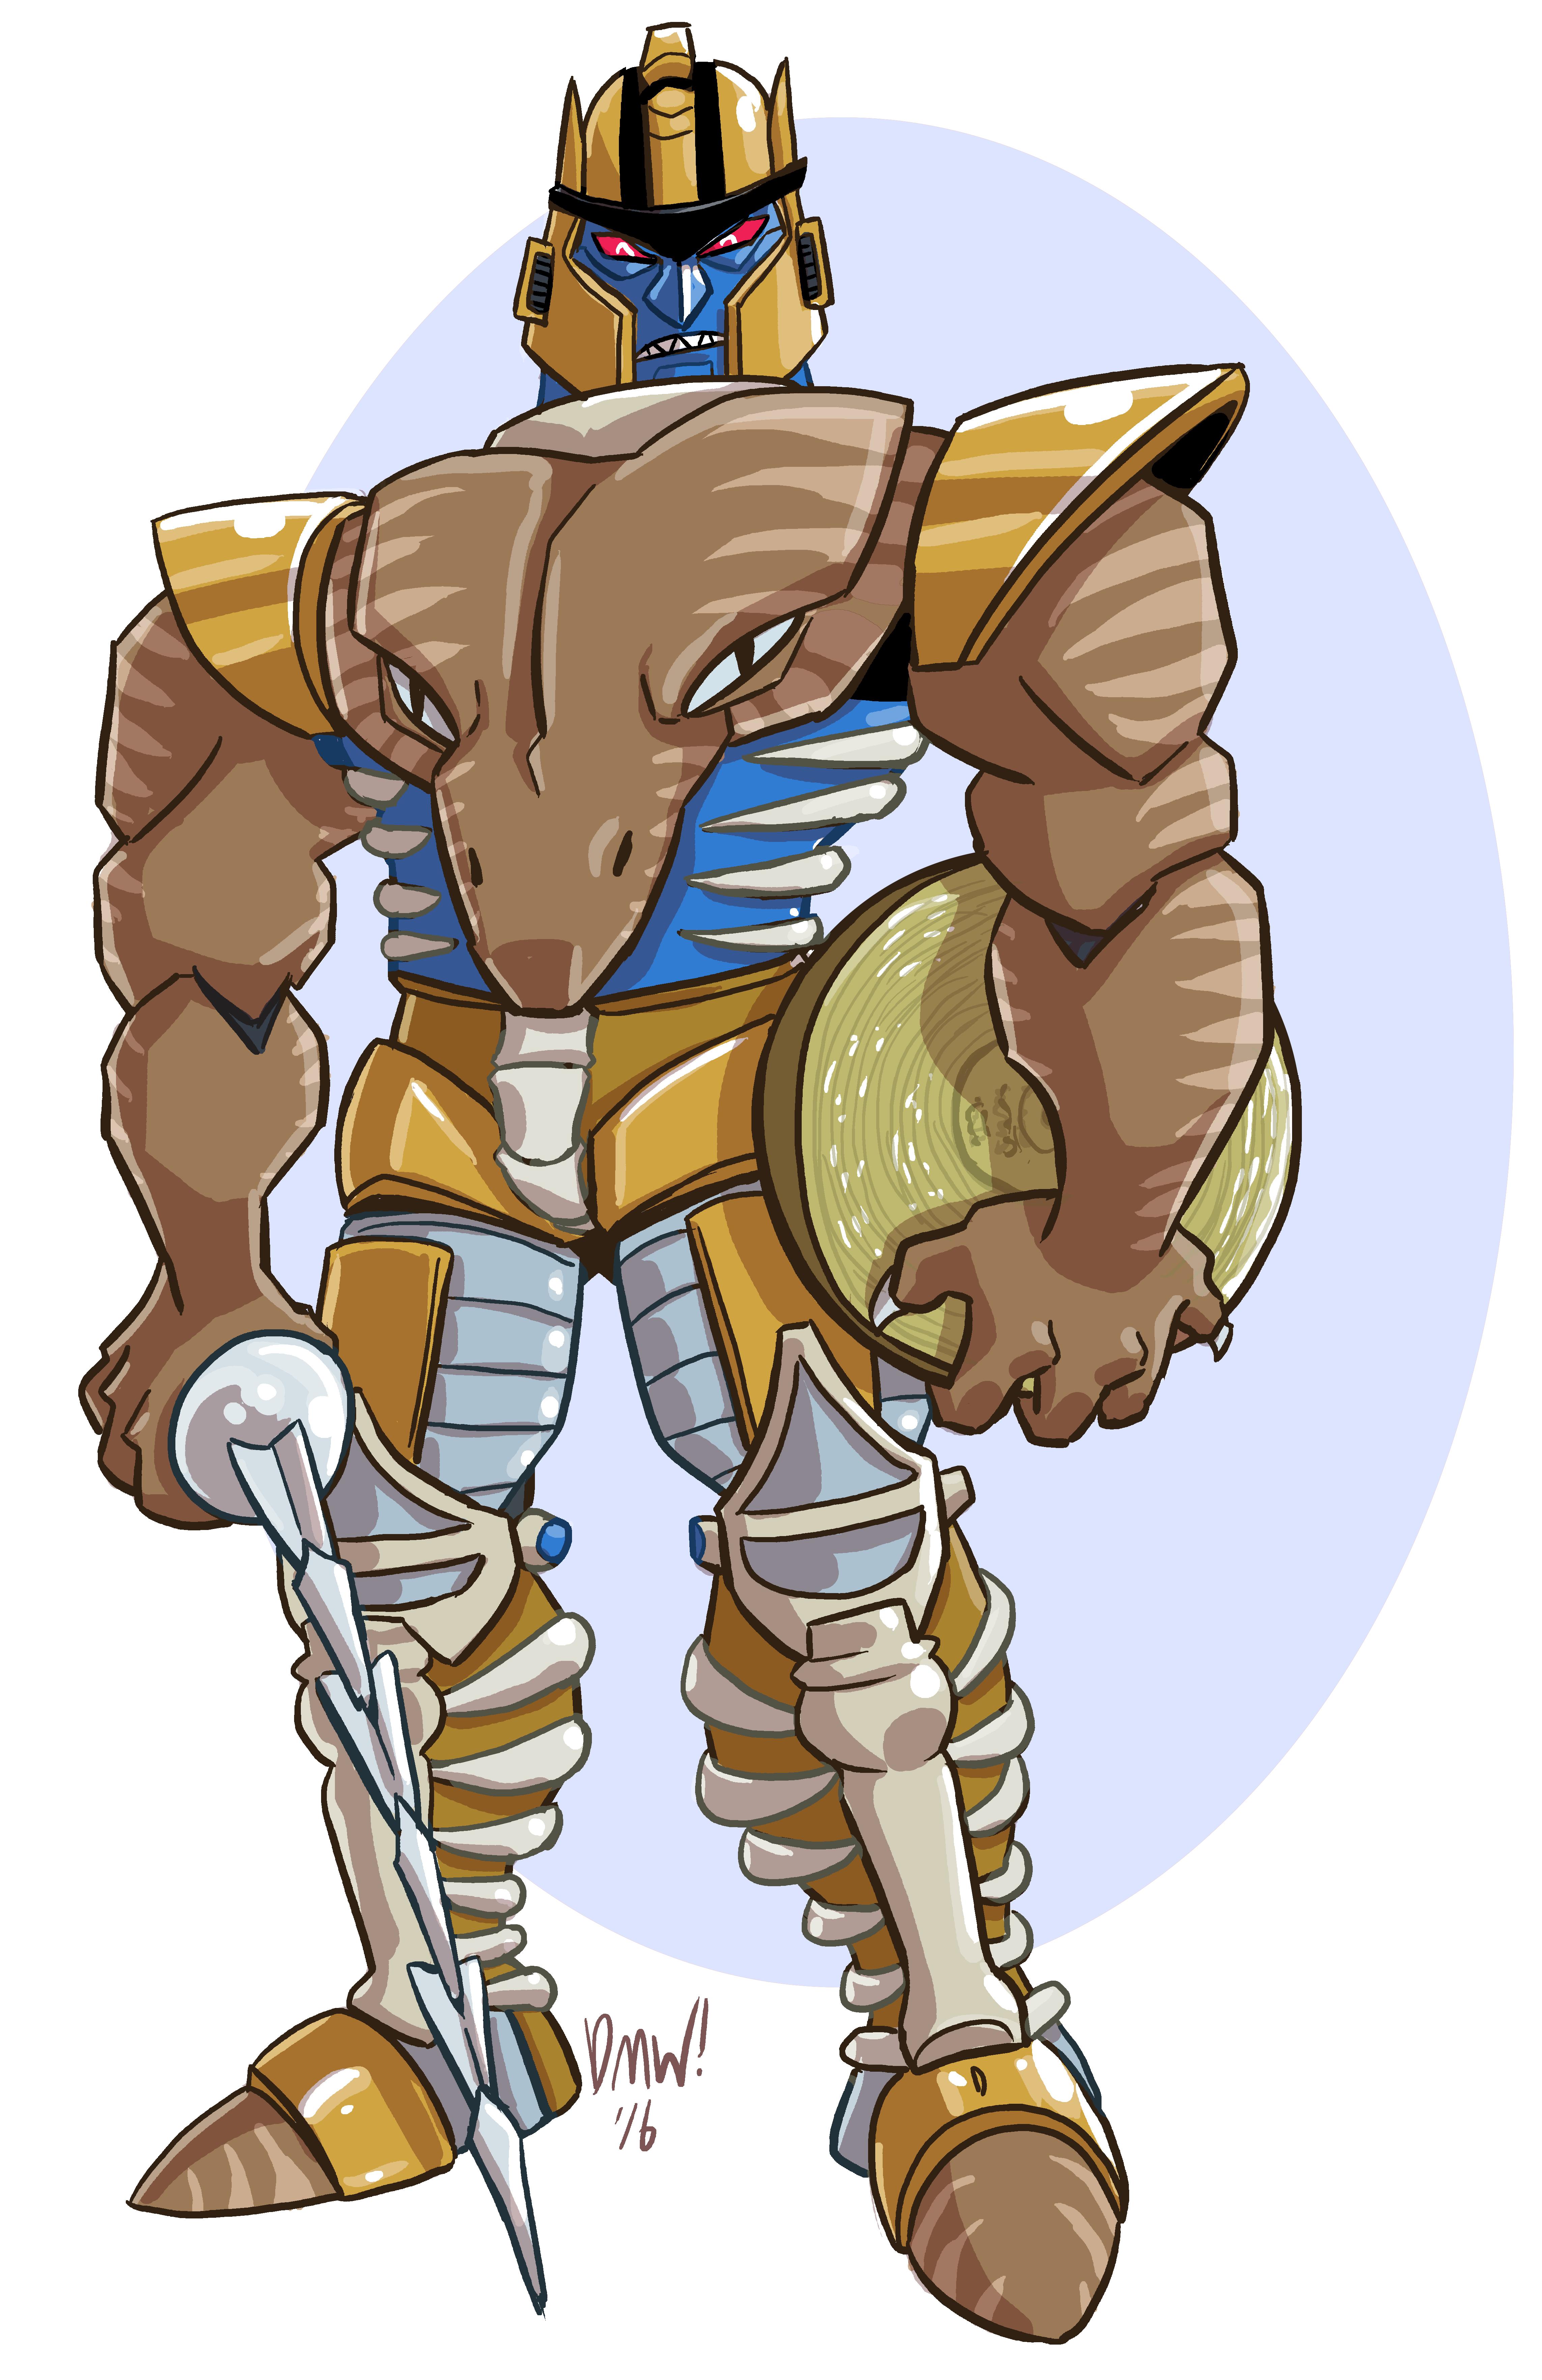 Dinobot by itswalky